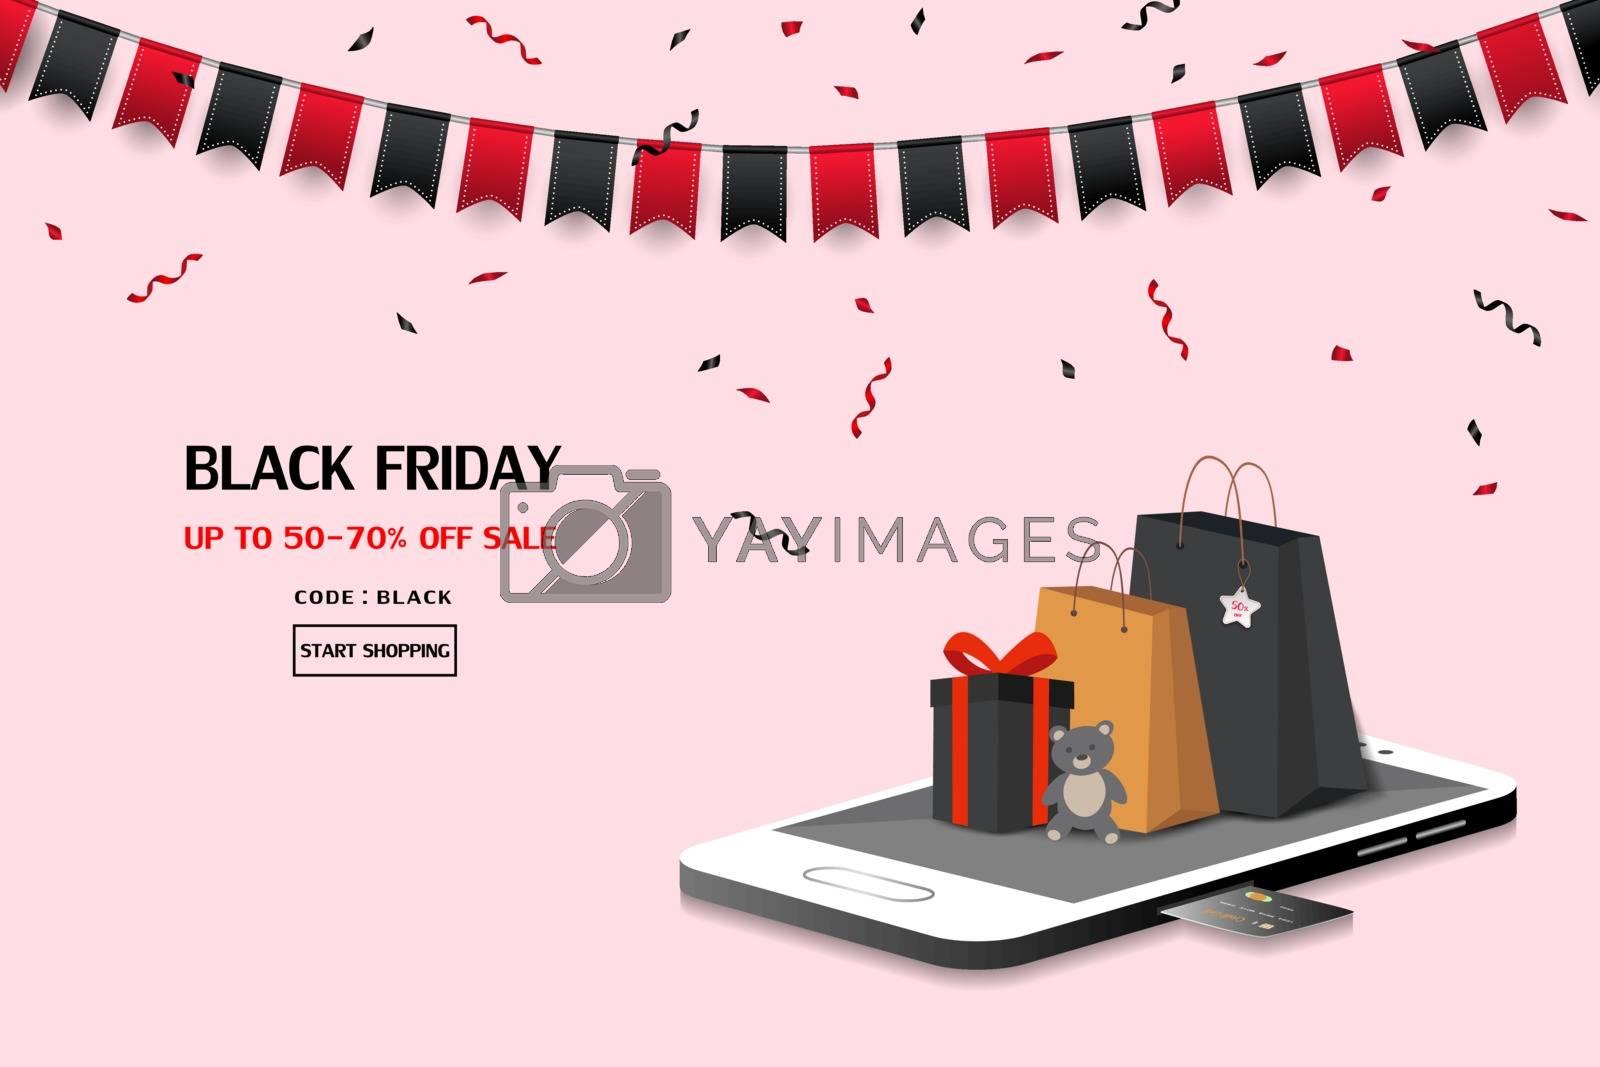 Black friday sale on mobile application or website,for advertising,shopping online,banner,poster or flyer,vector illustration